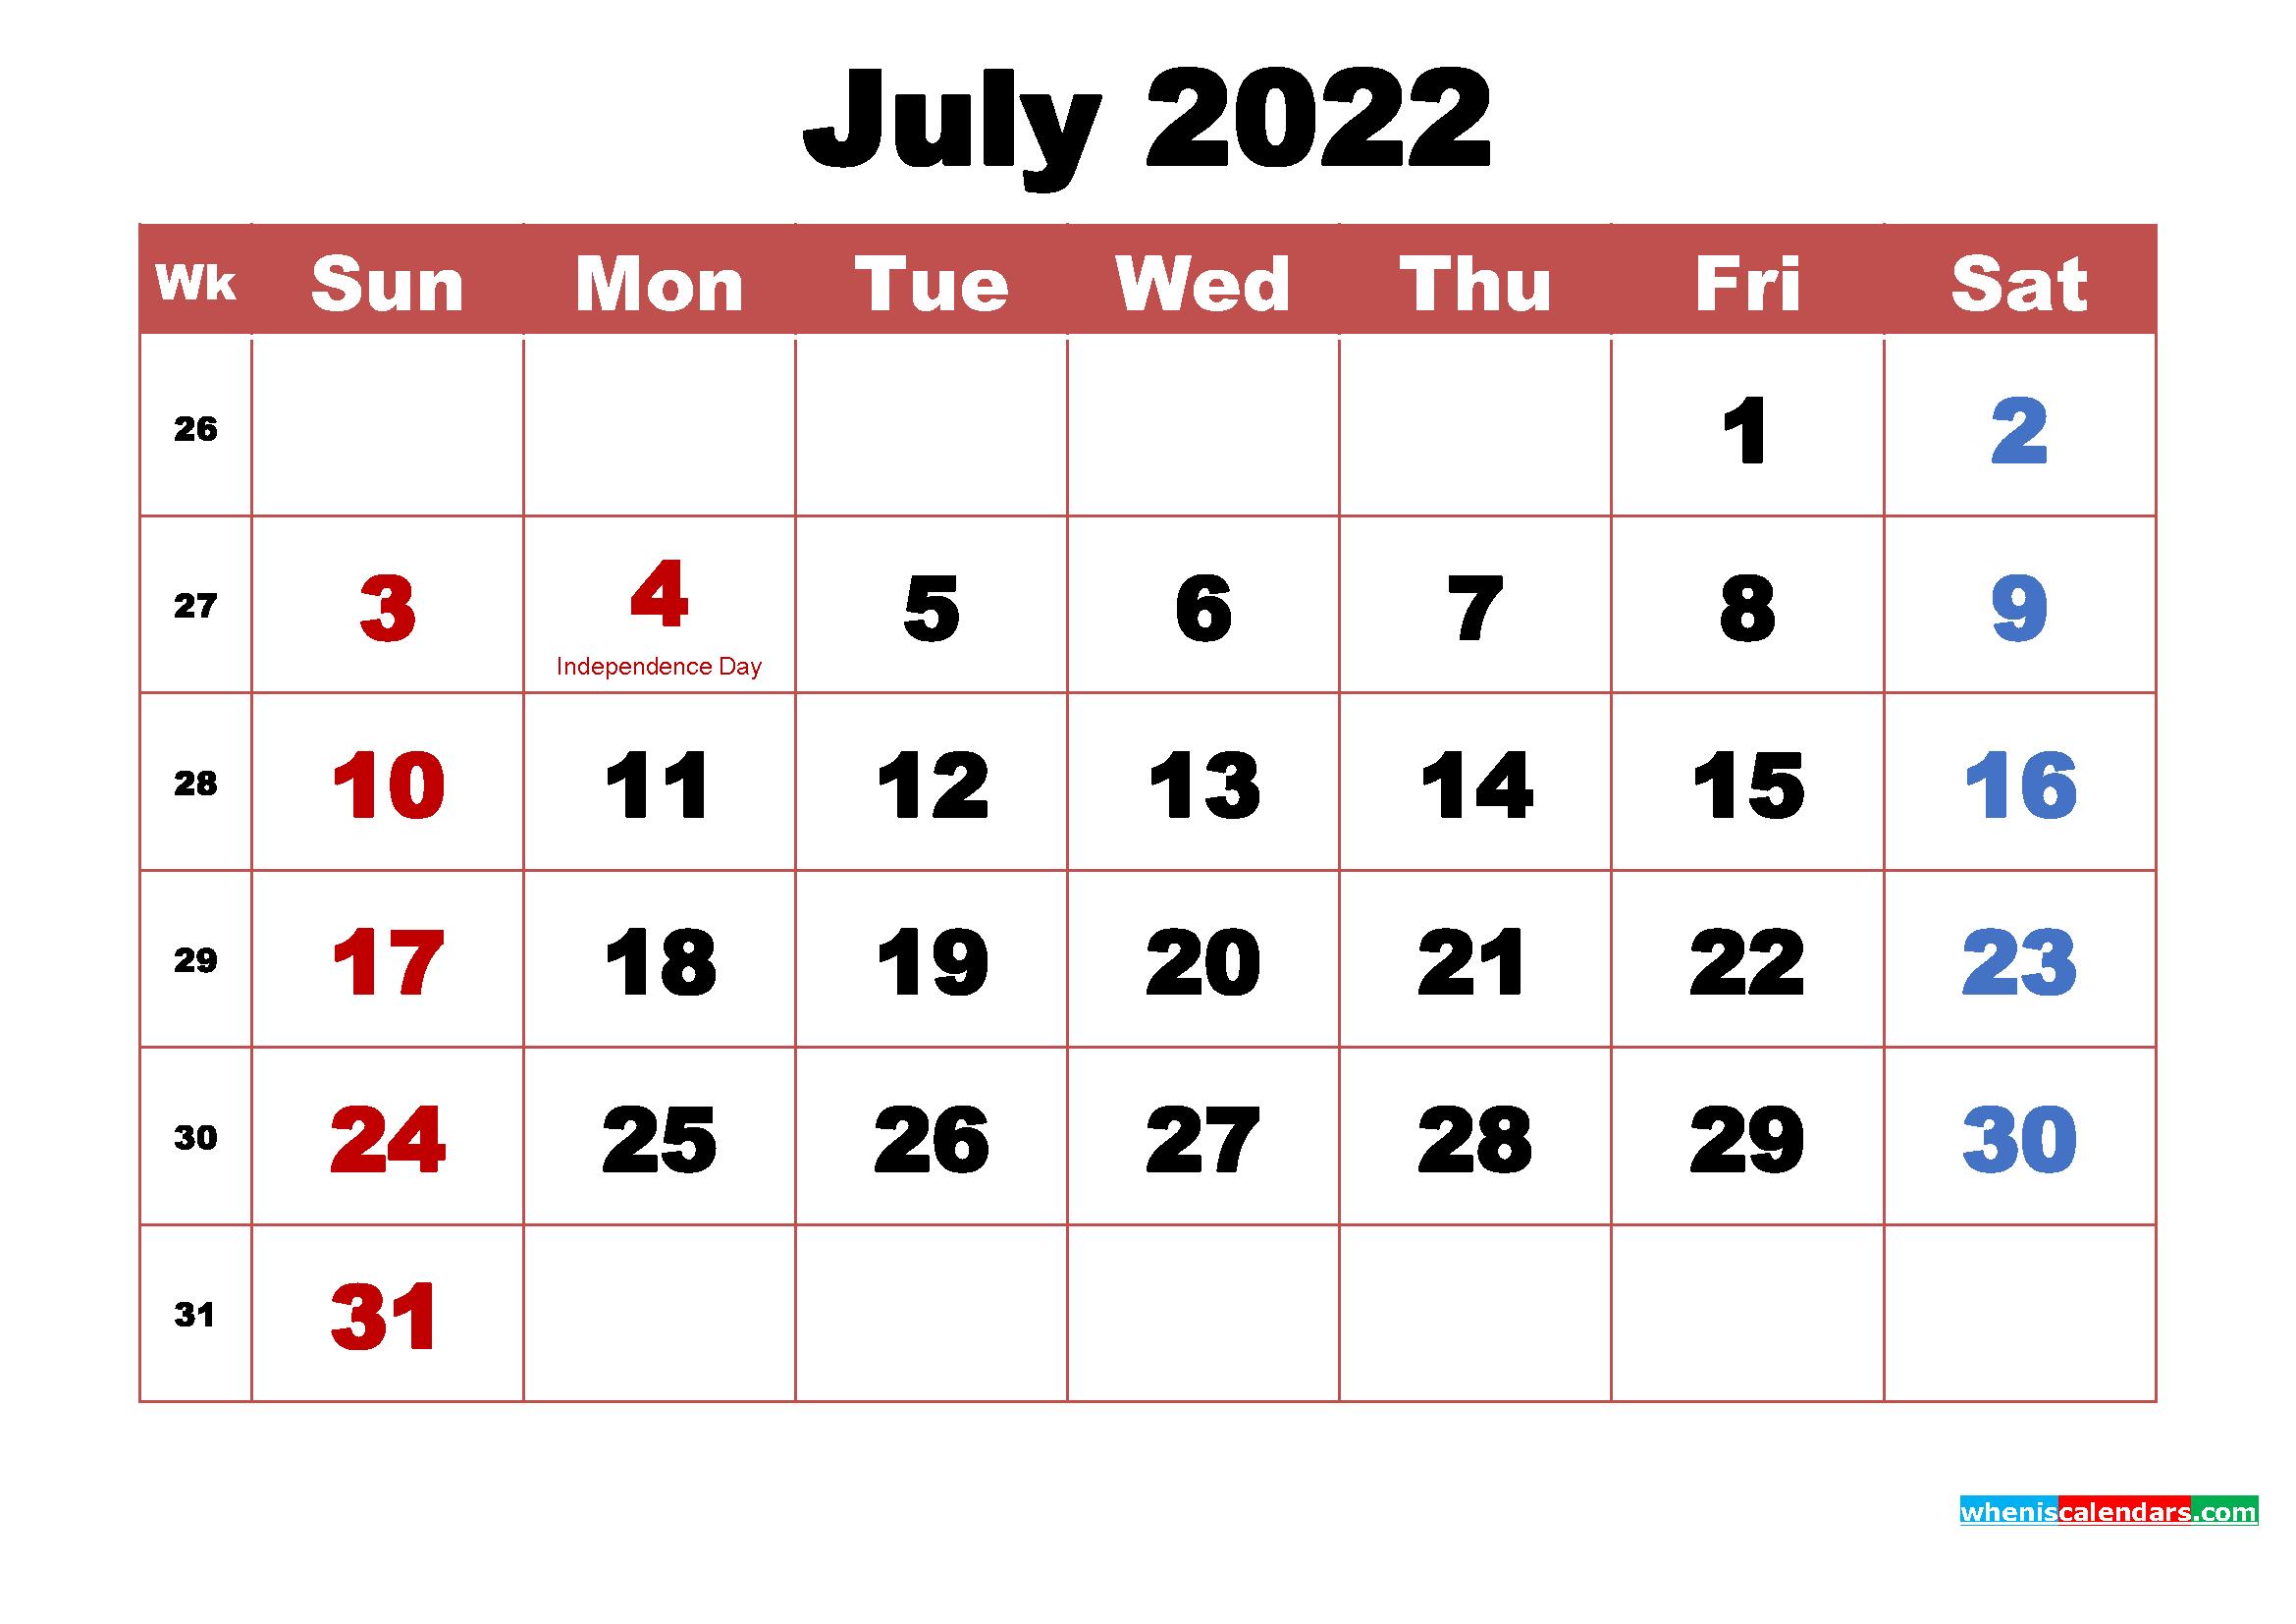 Printable July 2022 Calendar With Holidays Word, Pdf with Free Printable 2022 Planner With Holidays Graphics